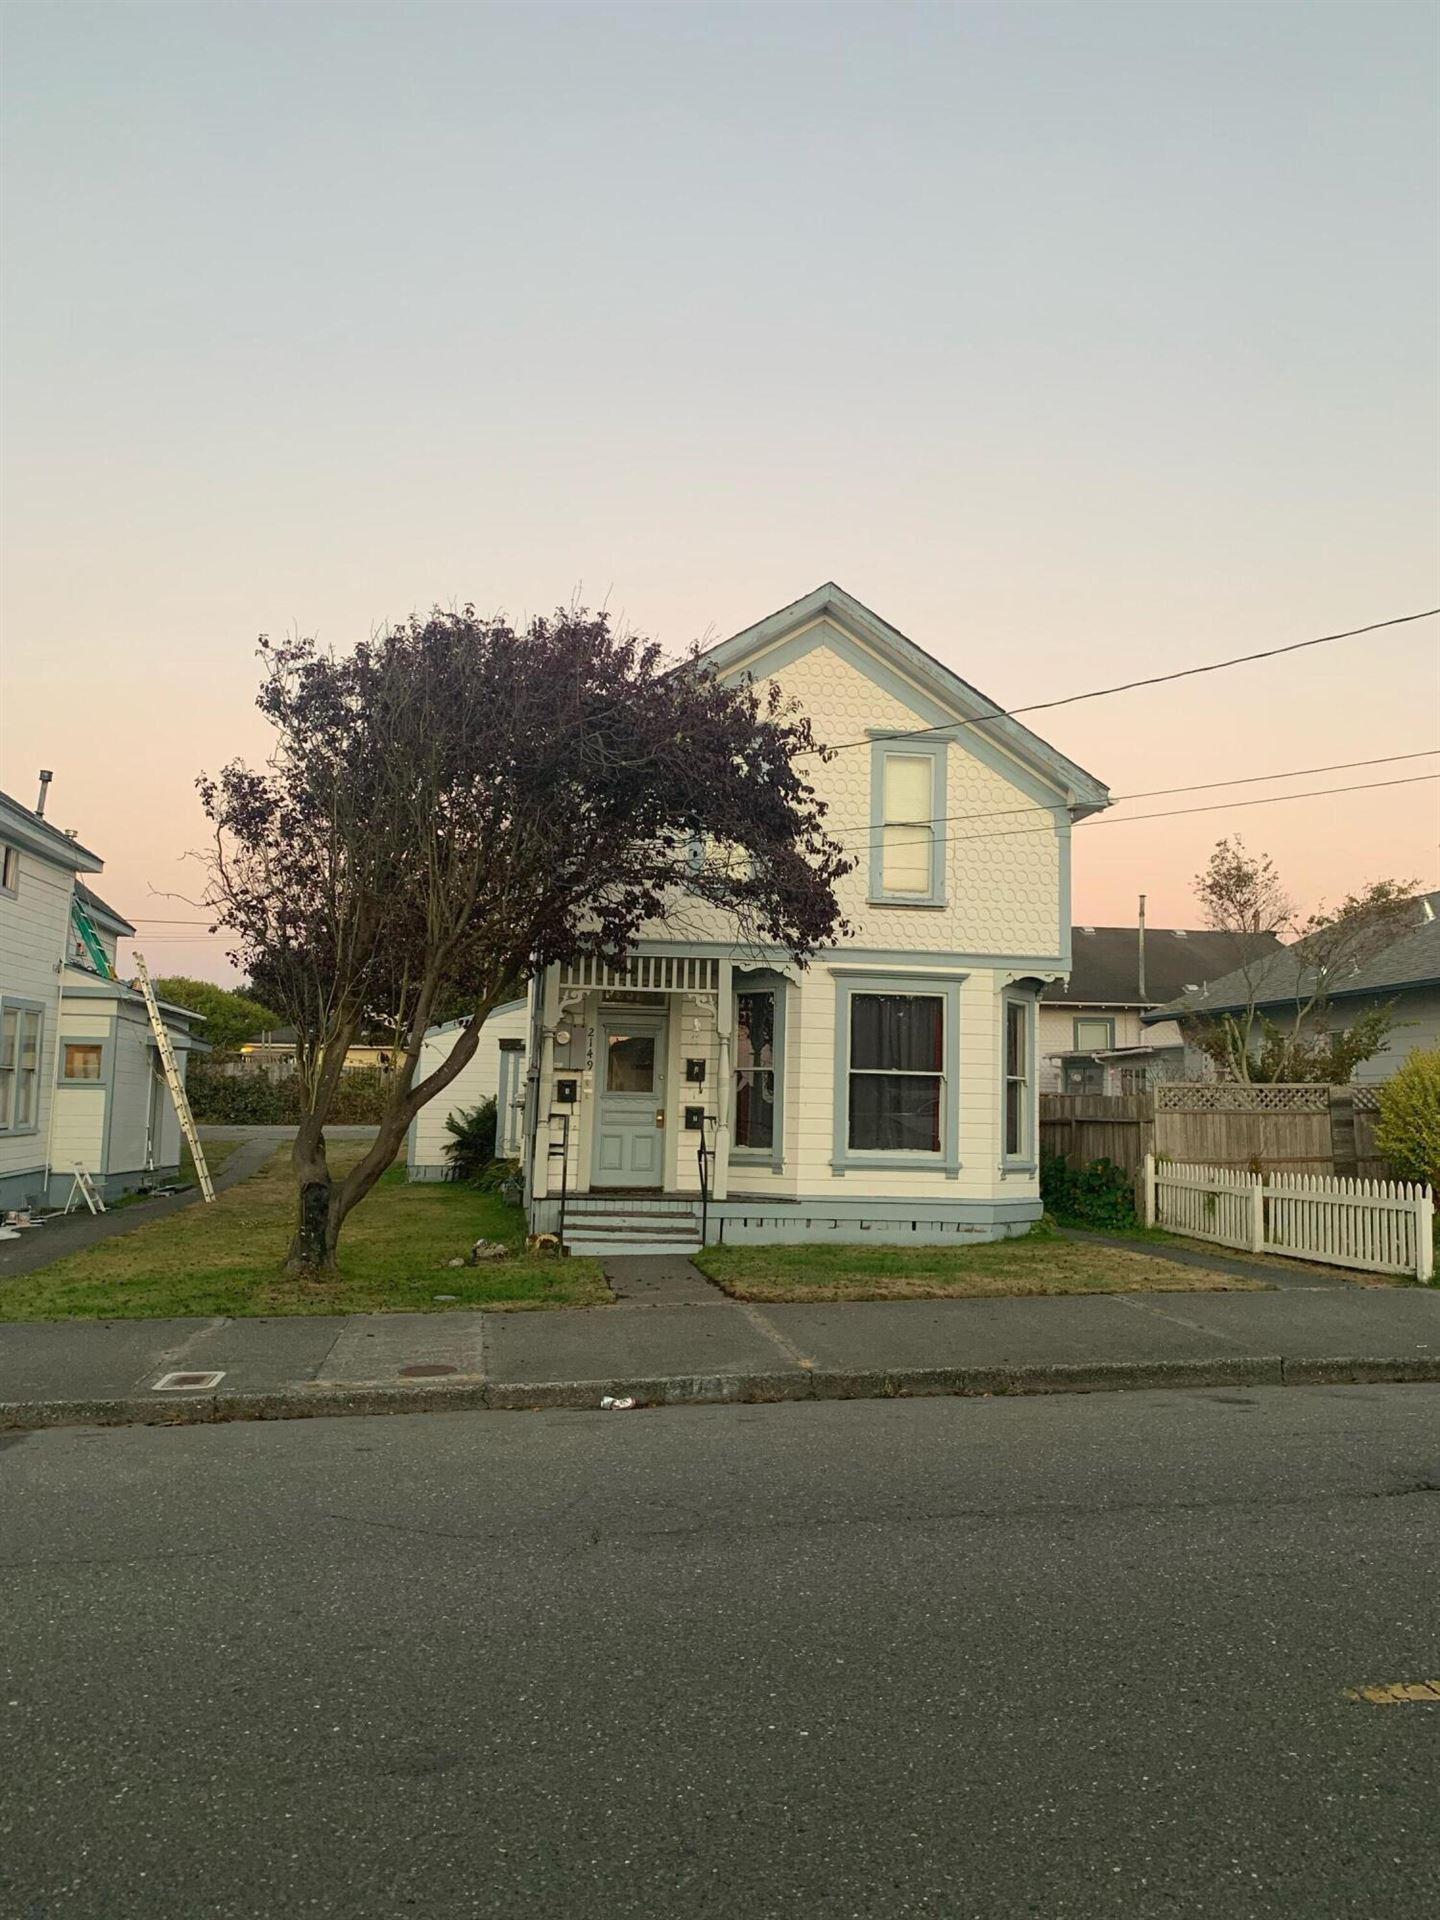 2149 California Street, Eureka, CA 95501 - MLS#: 260151